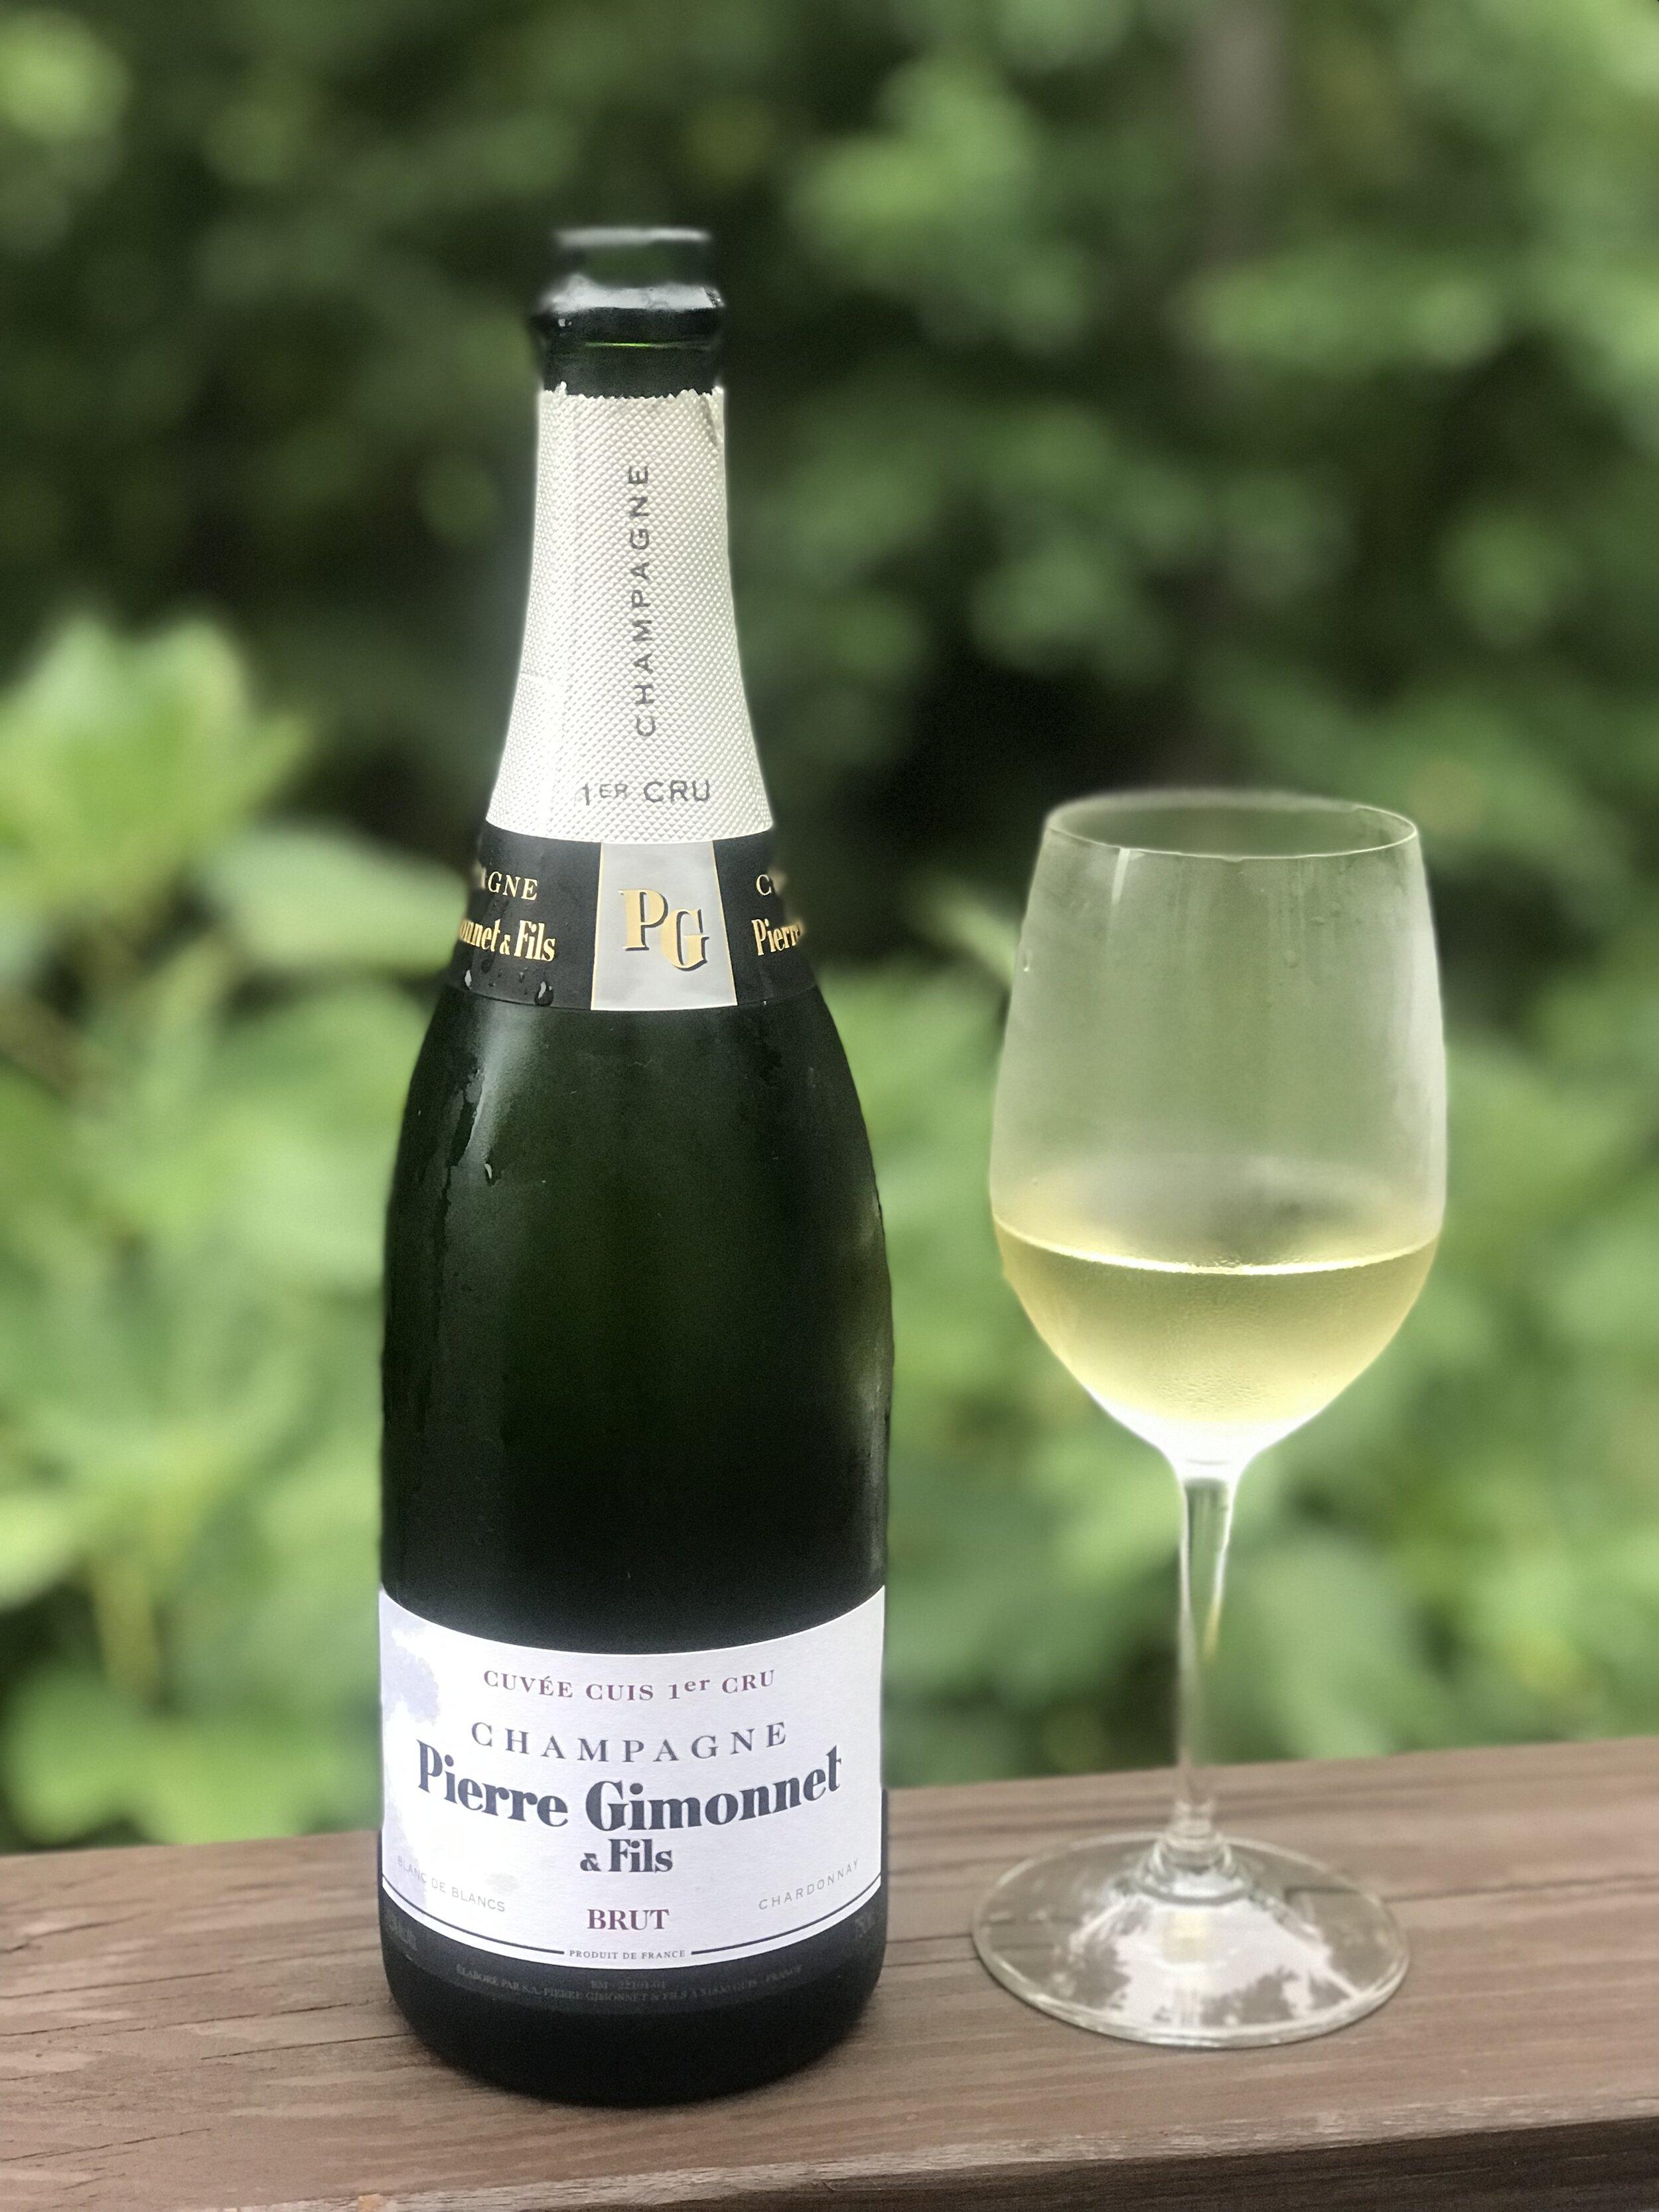 Pierre Gimonnet & Fils Brut Blanc de Blanc Champagne, Cuvee Crus 1er Cru.jpeg